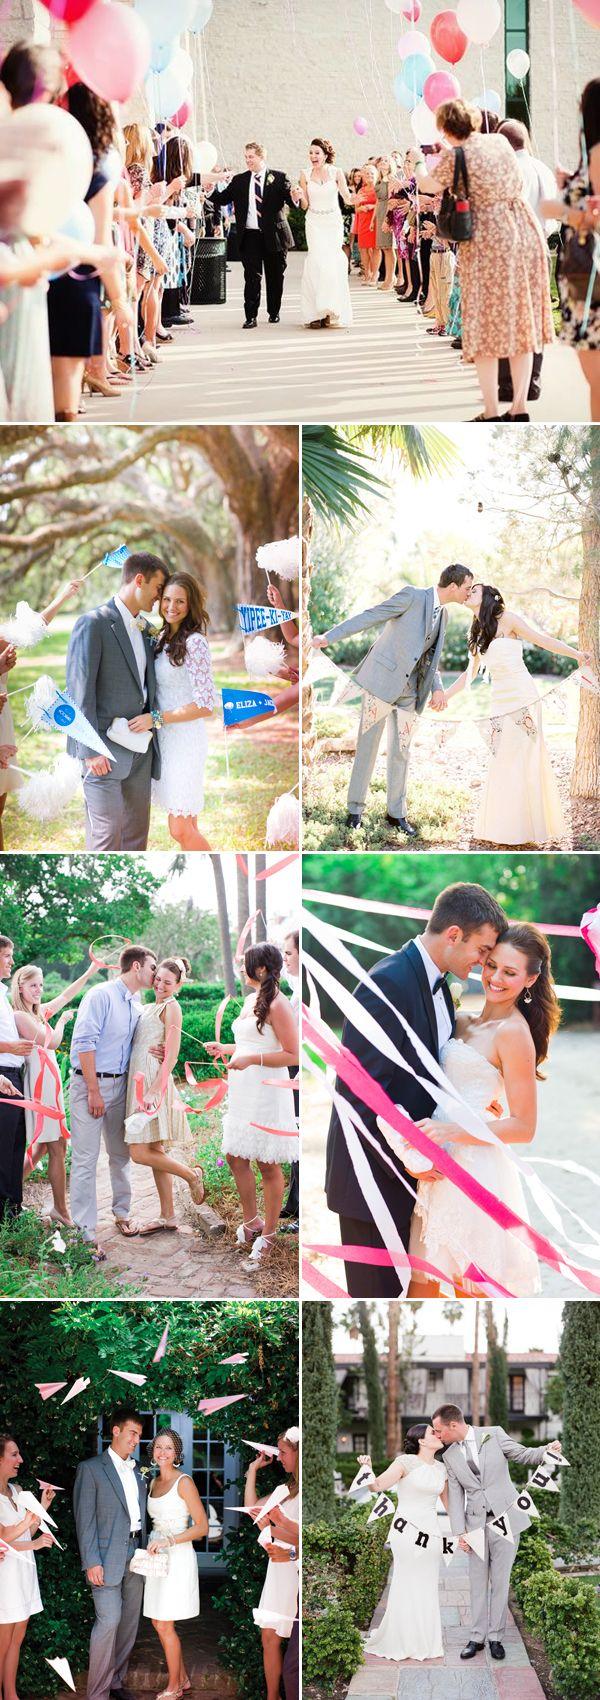 "Wedding Exit Ideas with fun Props   |   ""30 Creative Wedding Exit Ideas"" (http://www.praisewedding.com/archives/2775)"